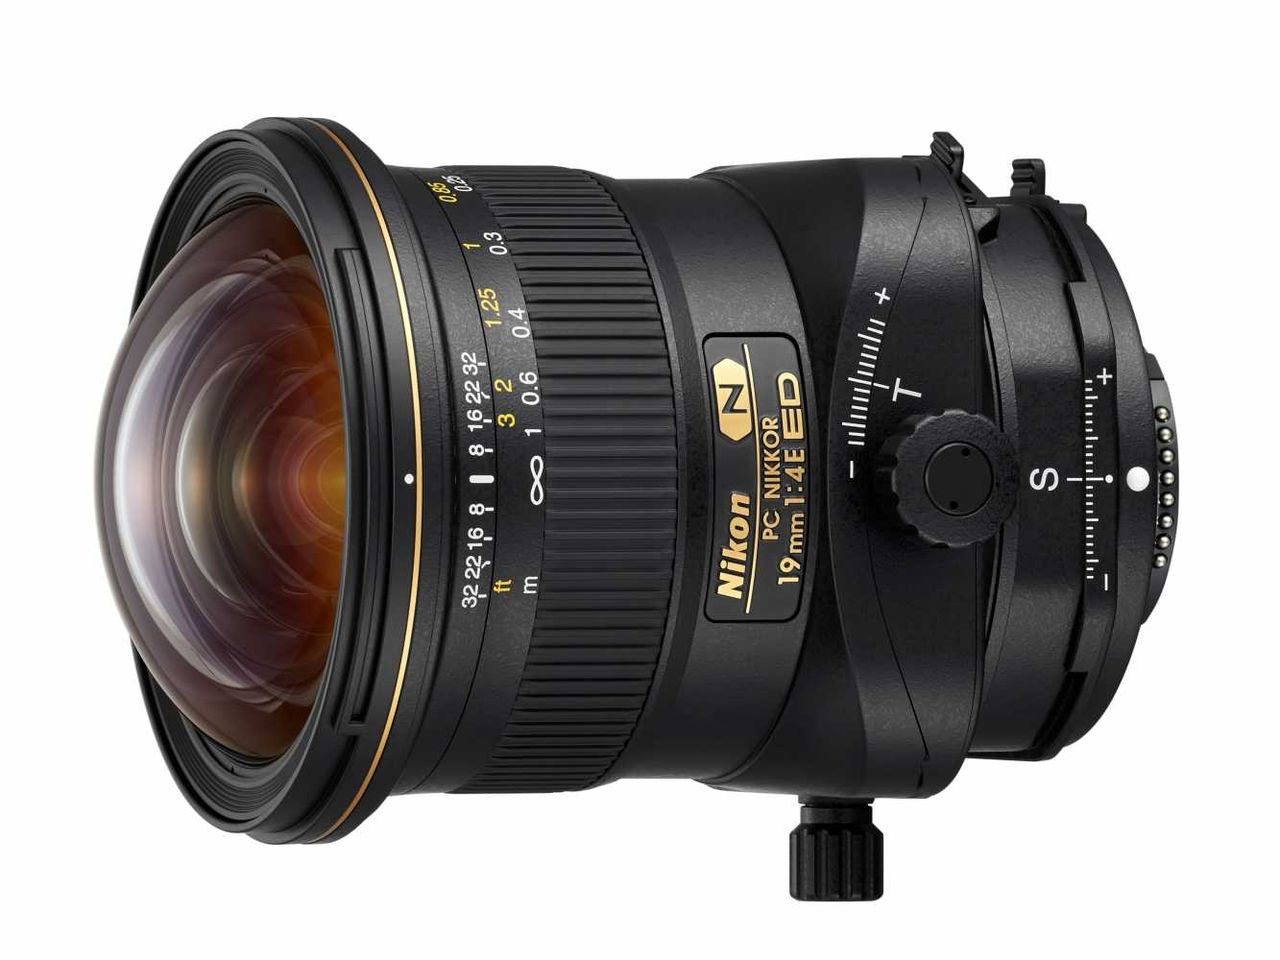 Nikon presenterar vidvinkeln Nikkor 19mm F4E ED